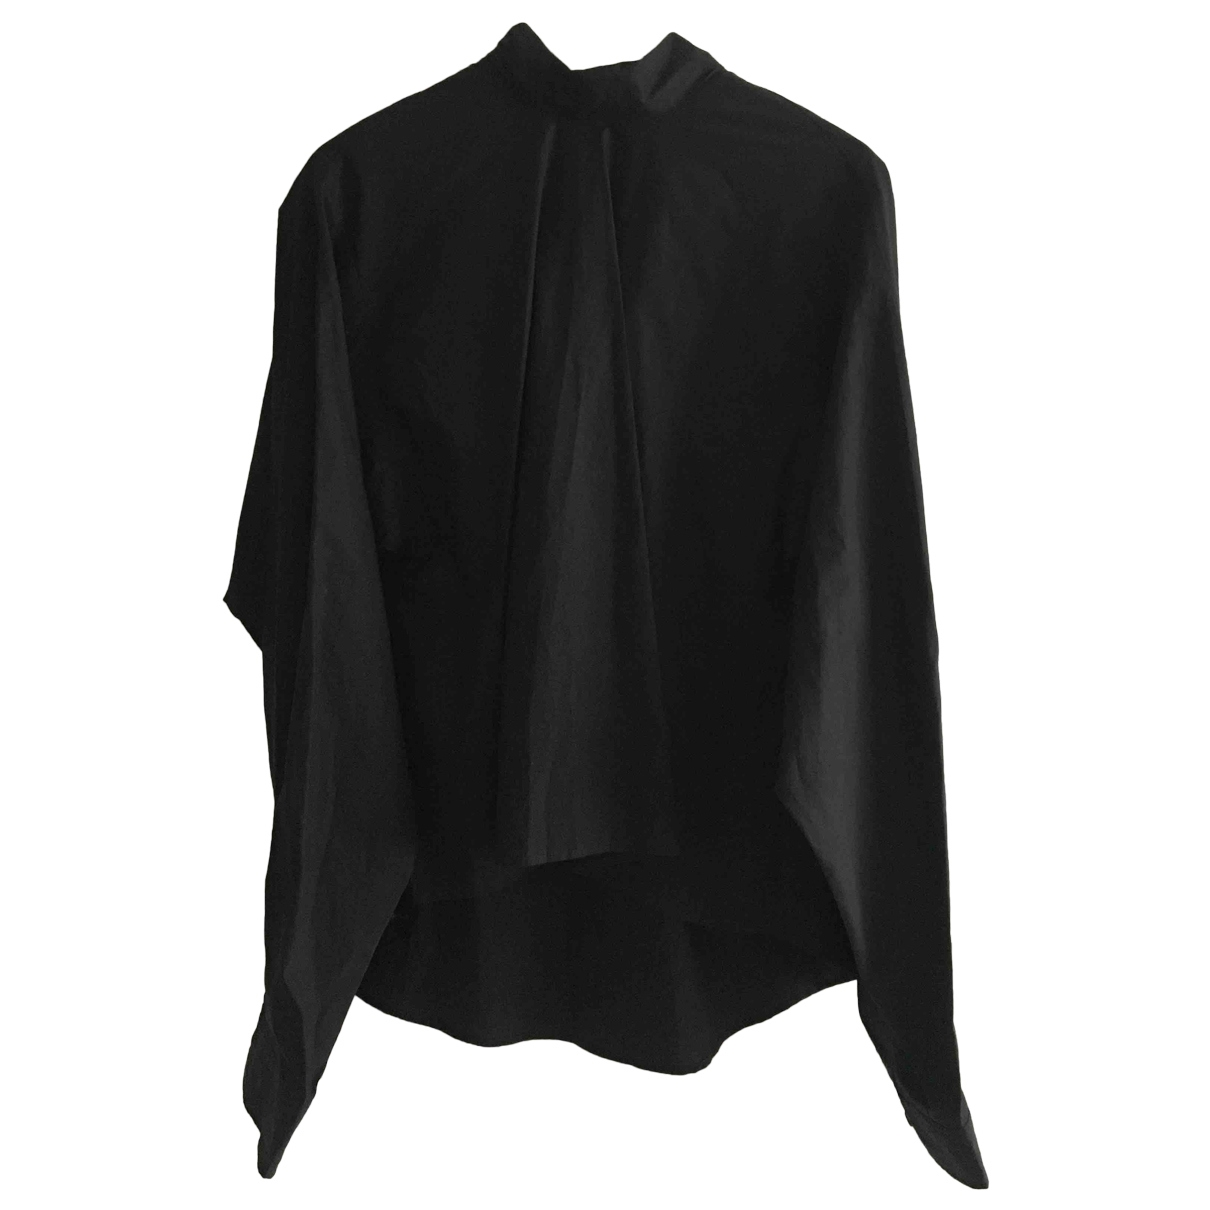 Mm6 \N Black Cotton  top for Women 40 FR